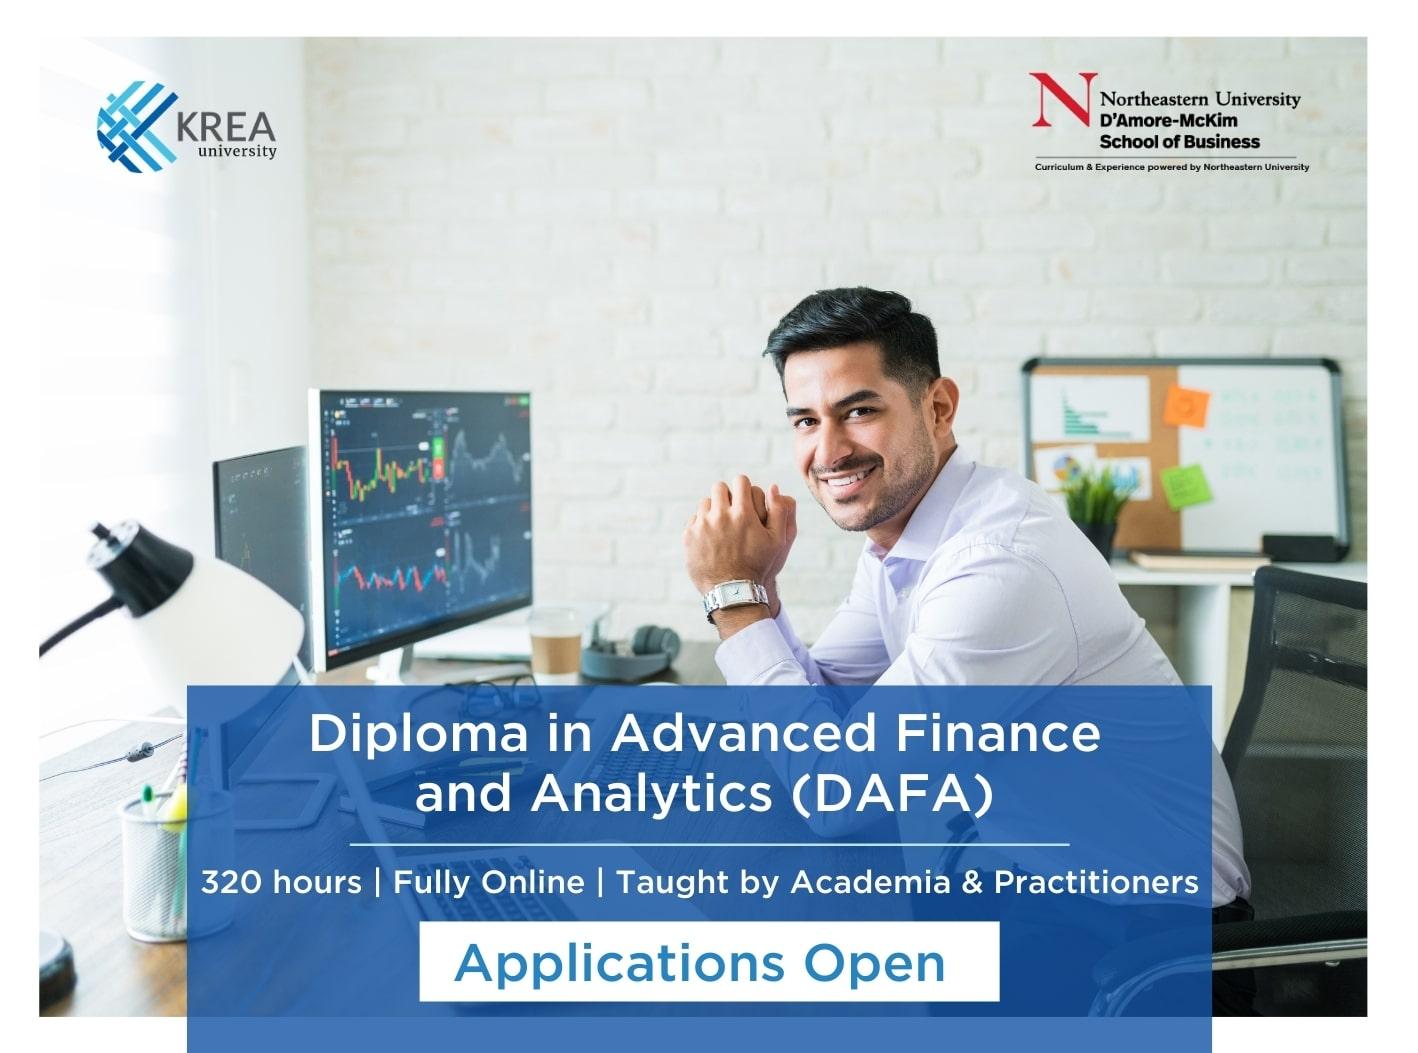 Krea University launches Diploma in Advanced Finance & Analytics (DAFA)